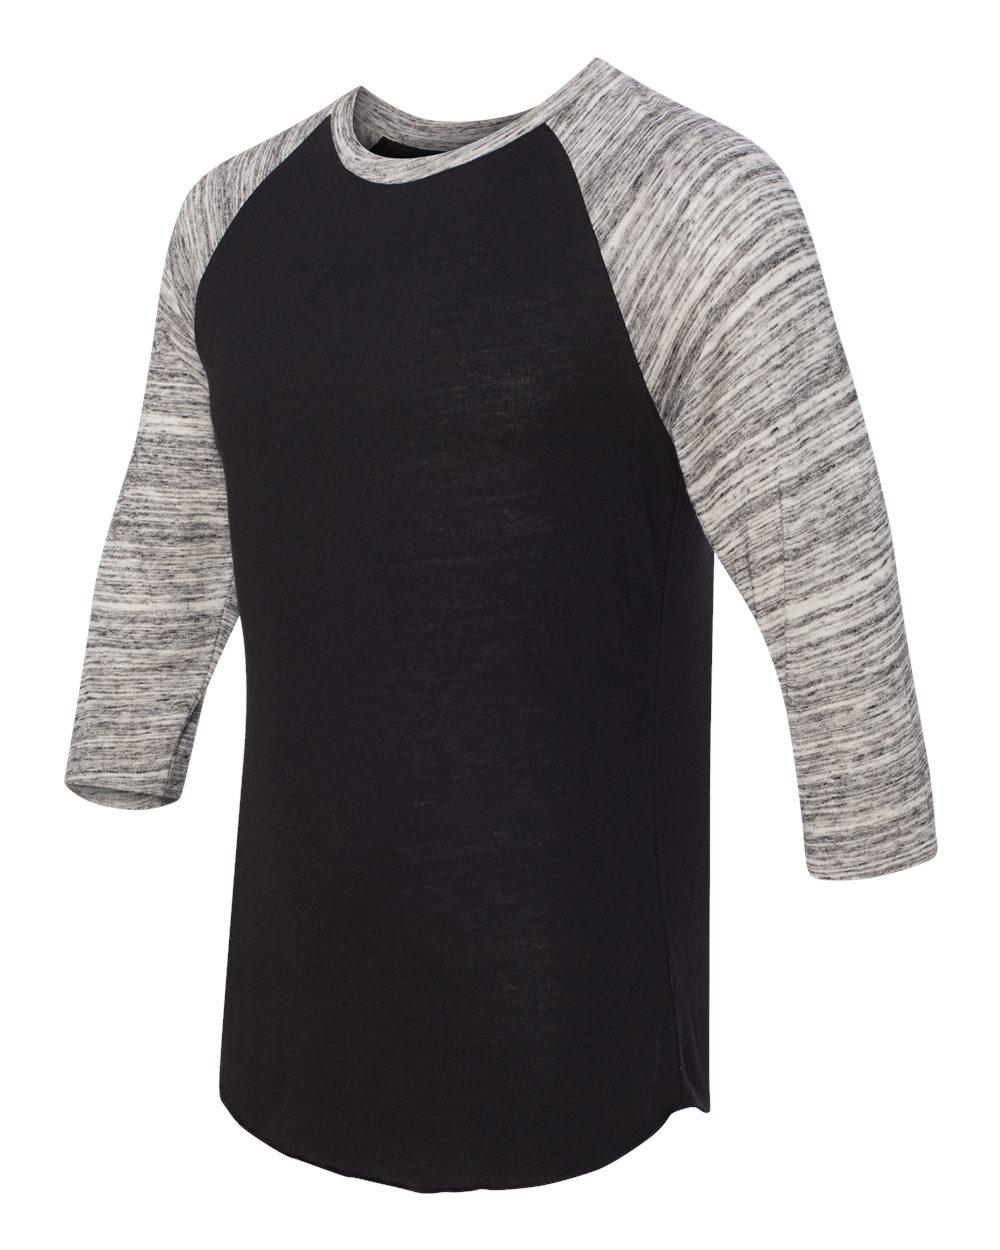 click to view Eco True Black/ Urban Grey